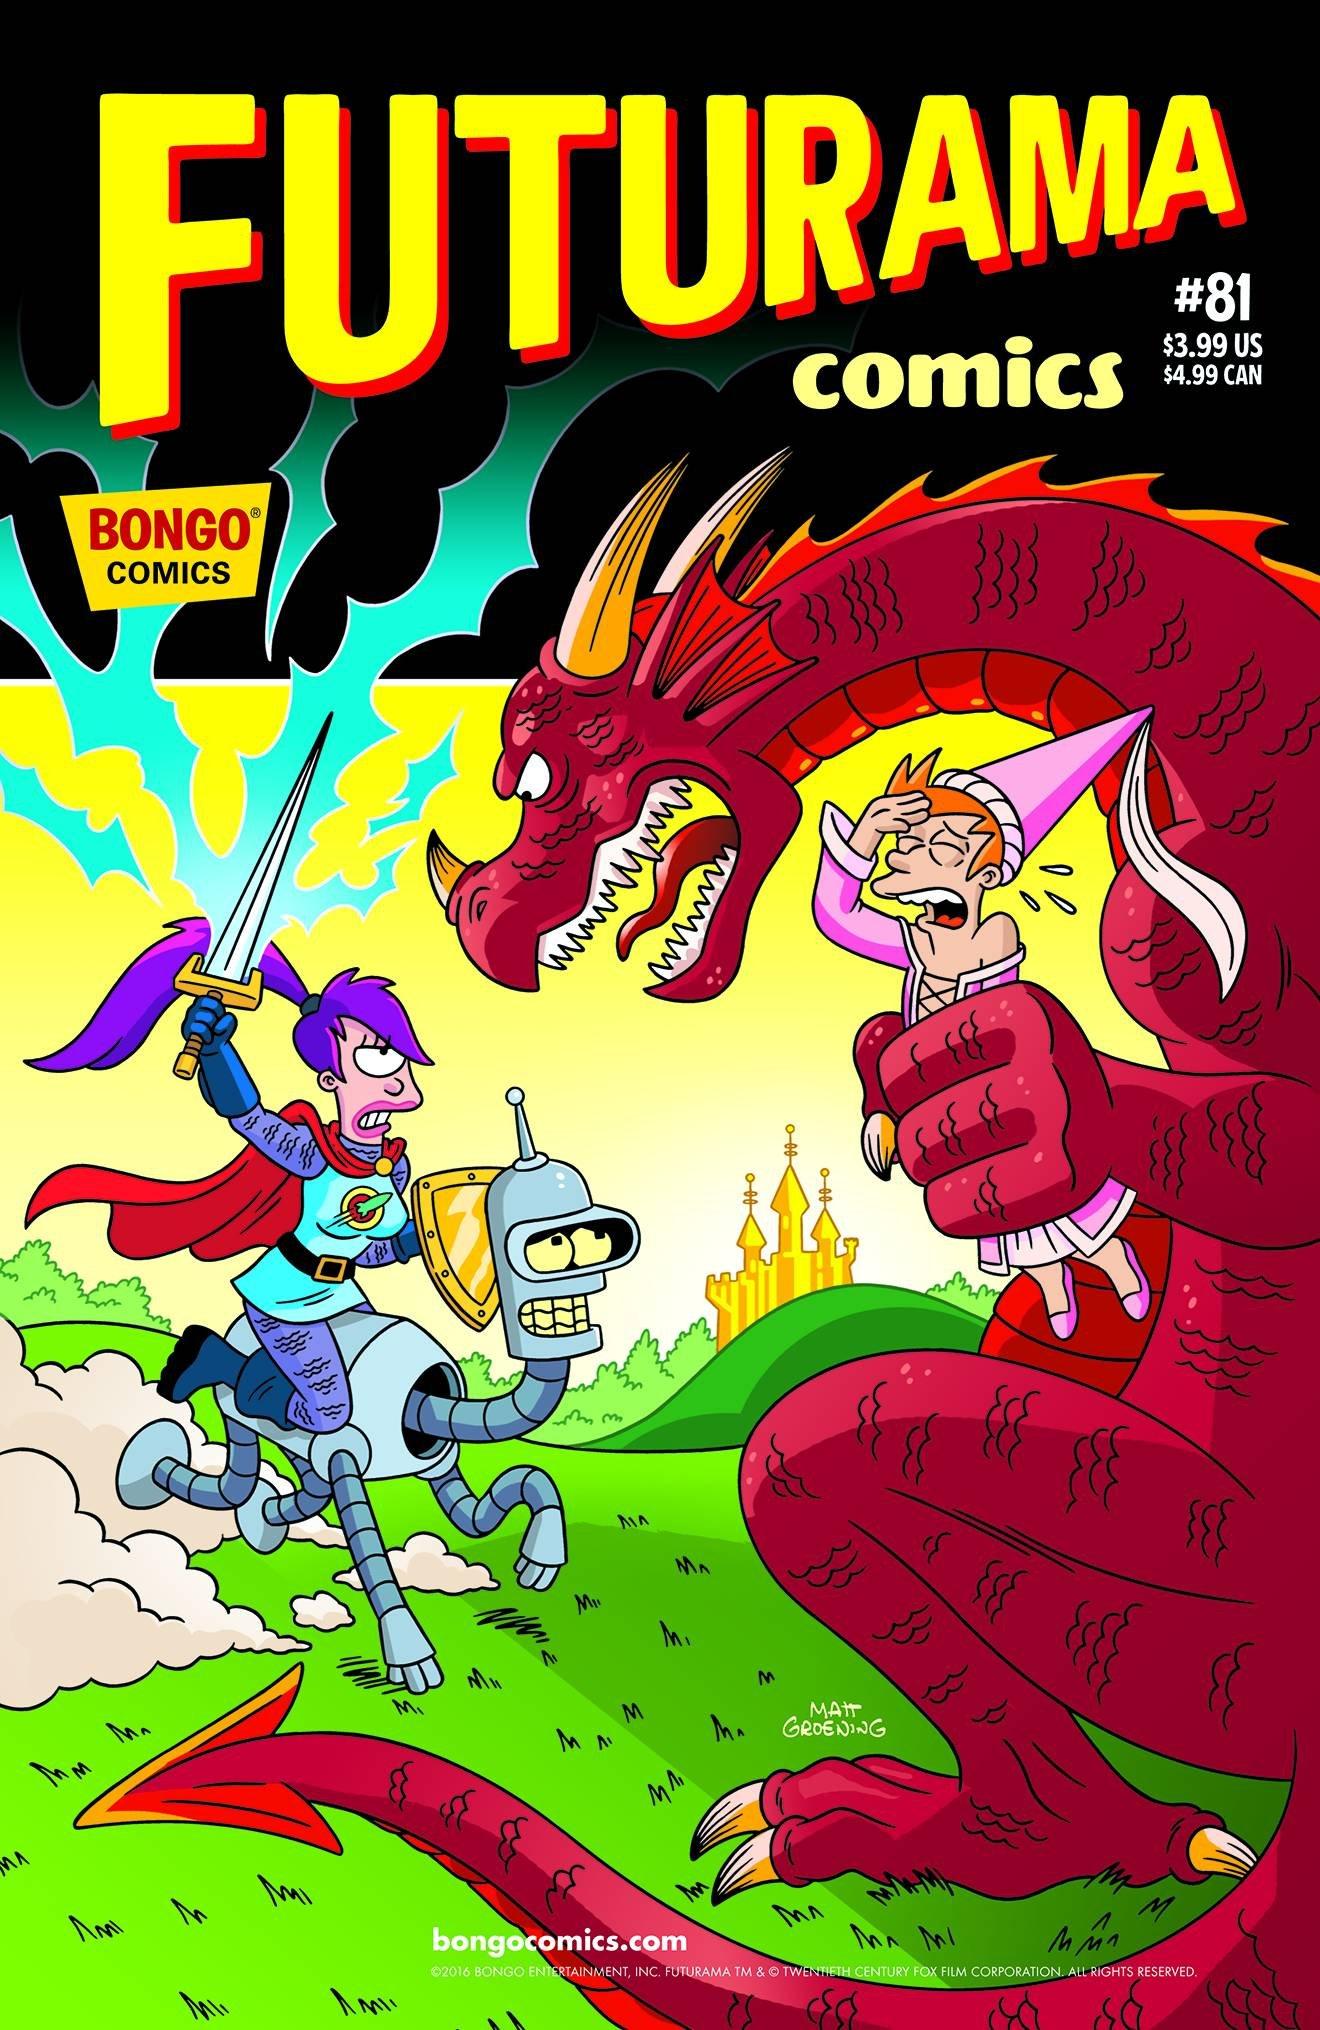 FUTURAMA COMICS #81 Comics – 2016